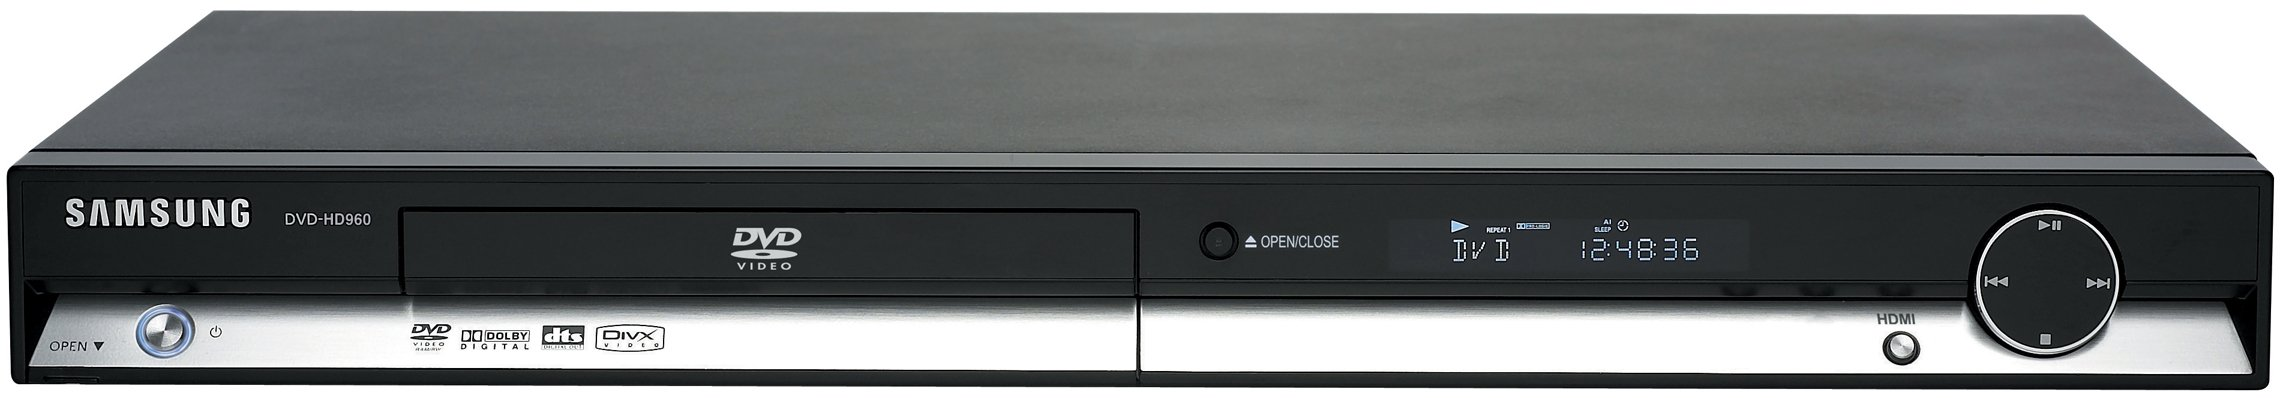 Samsung DVD-HD860 Up-Converting DVD Player